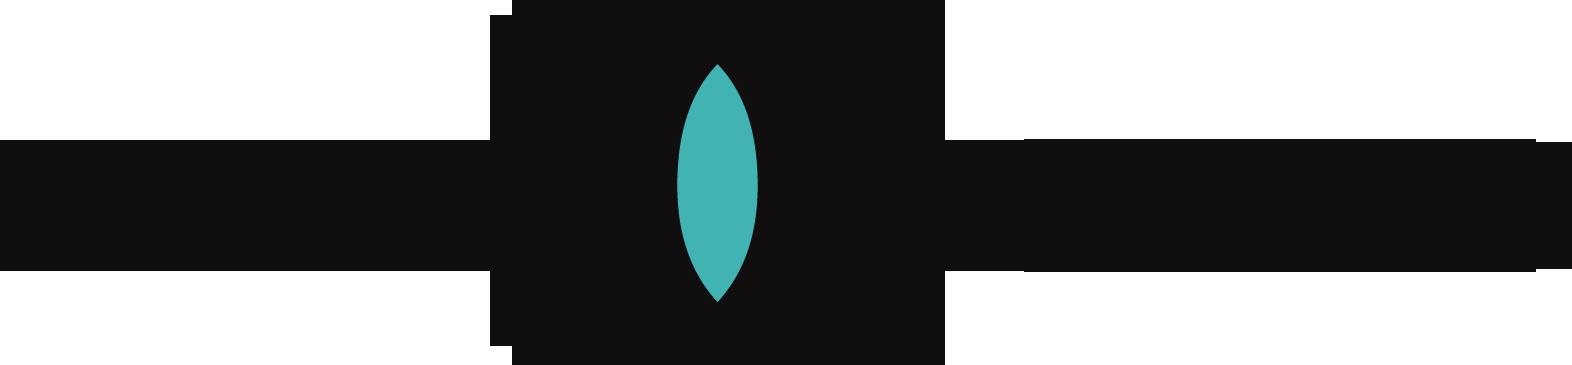 cc_black_logo.png